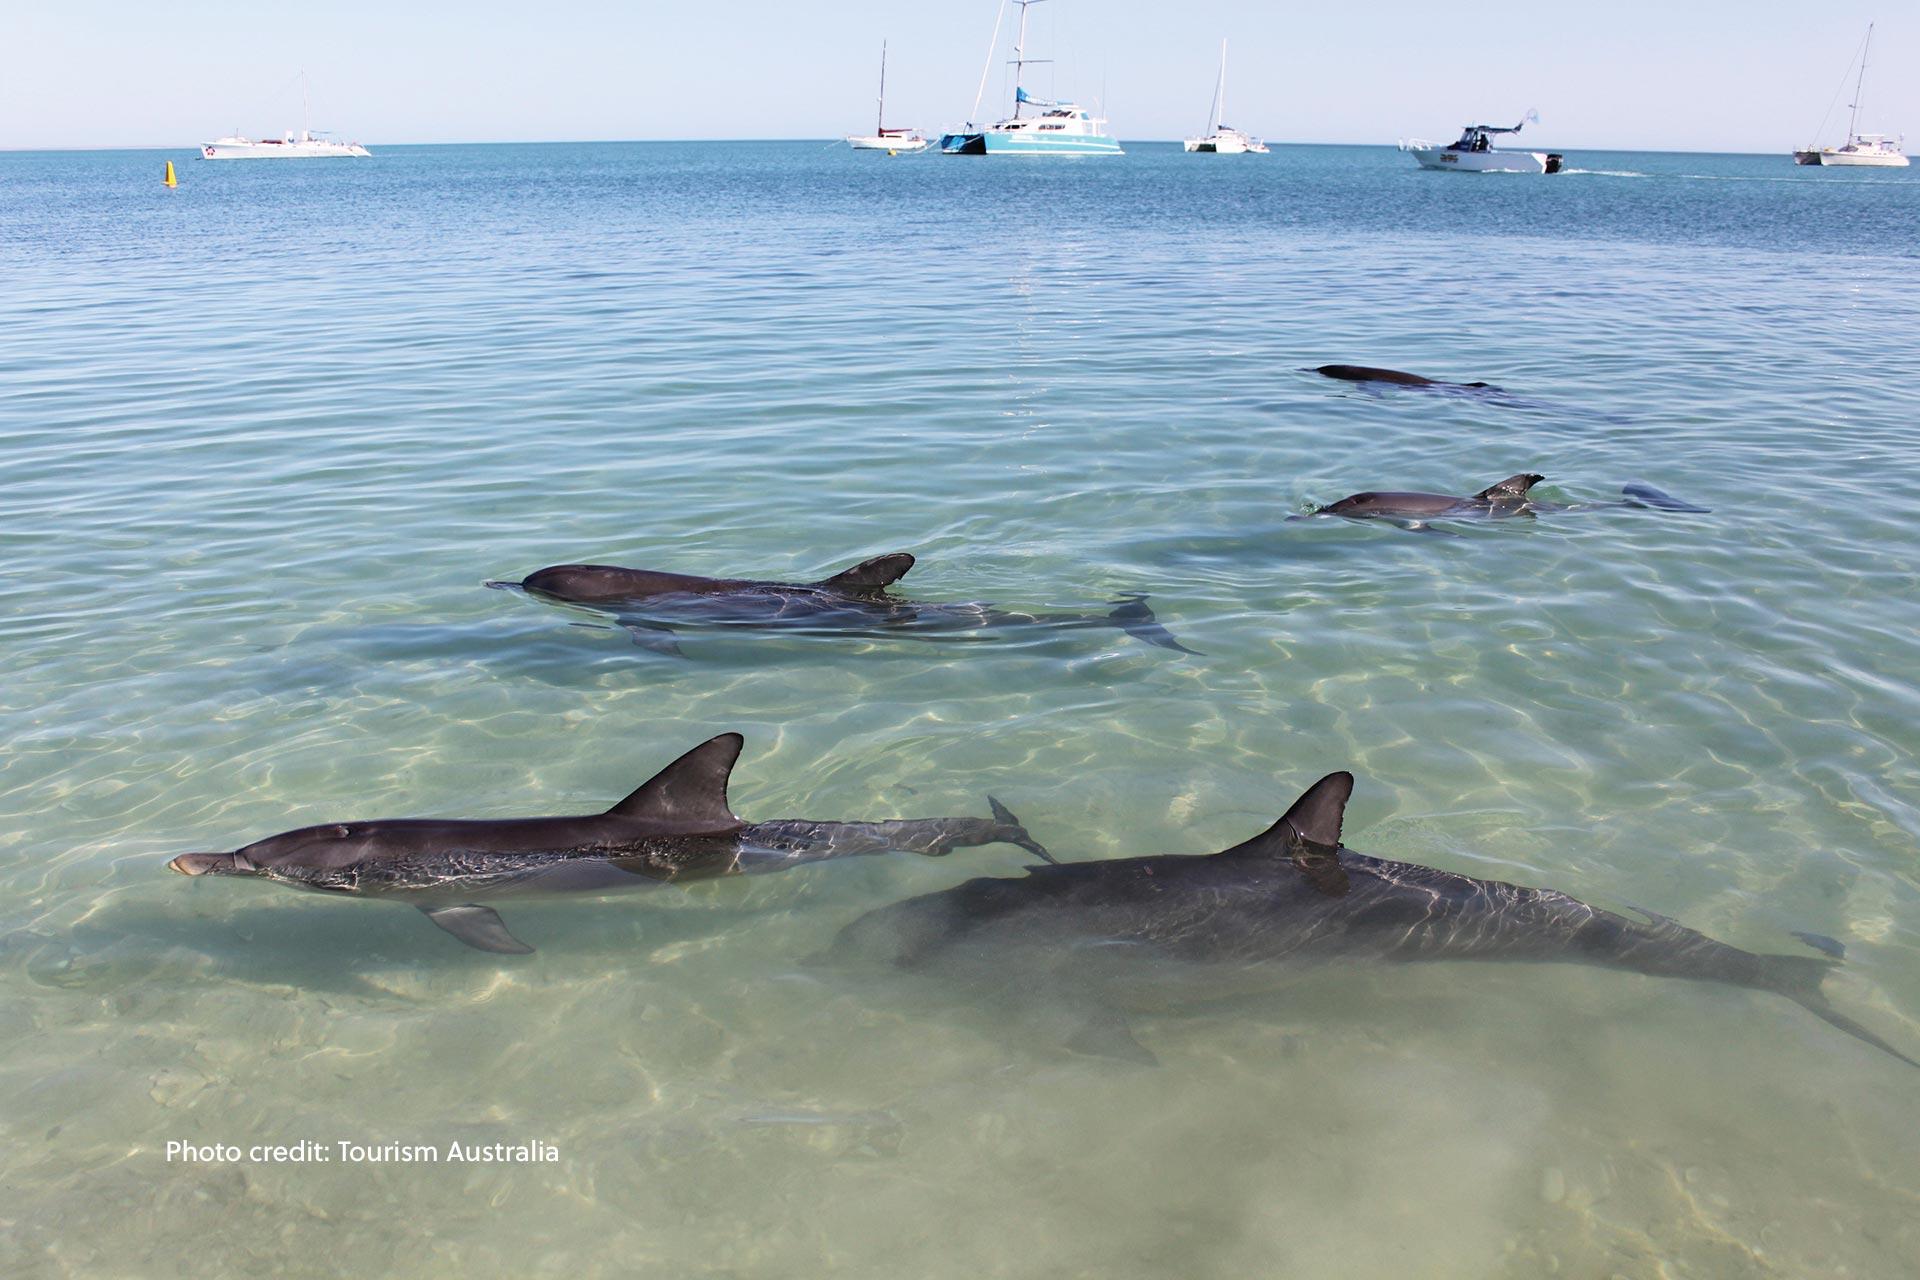 Dolphins come to shore at Monkey Mia, Western Australia